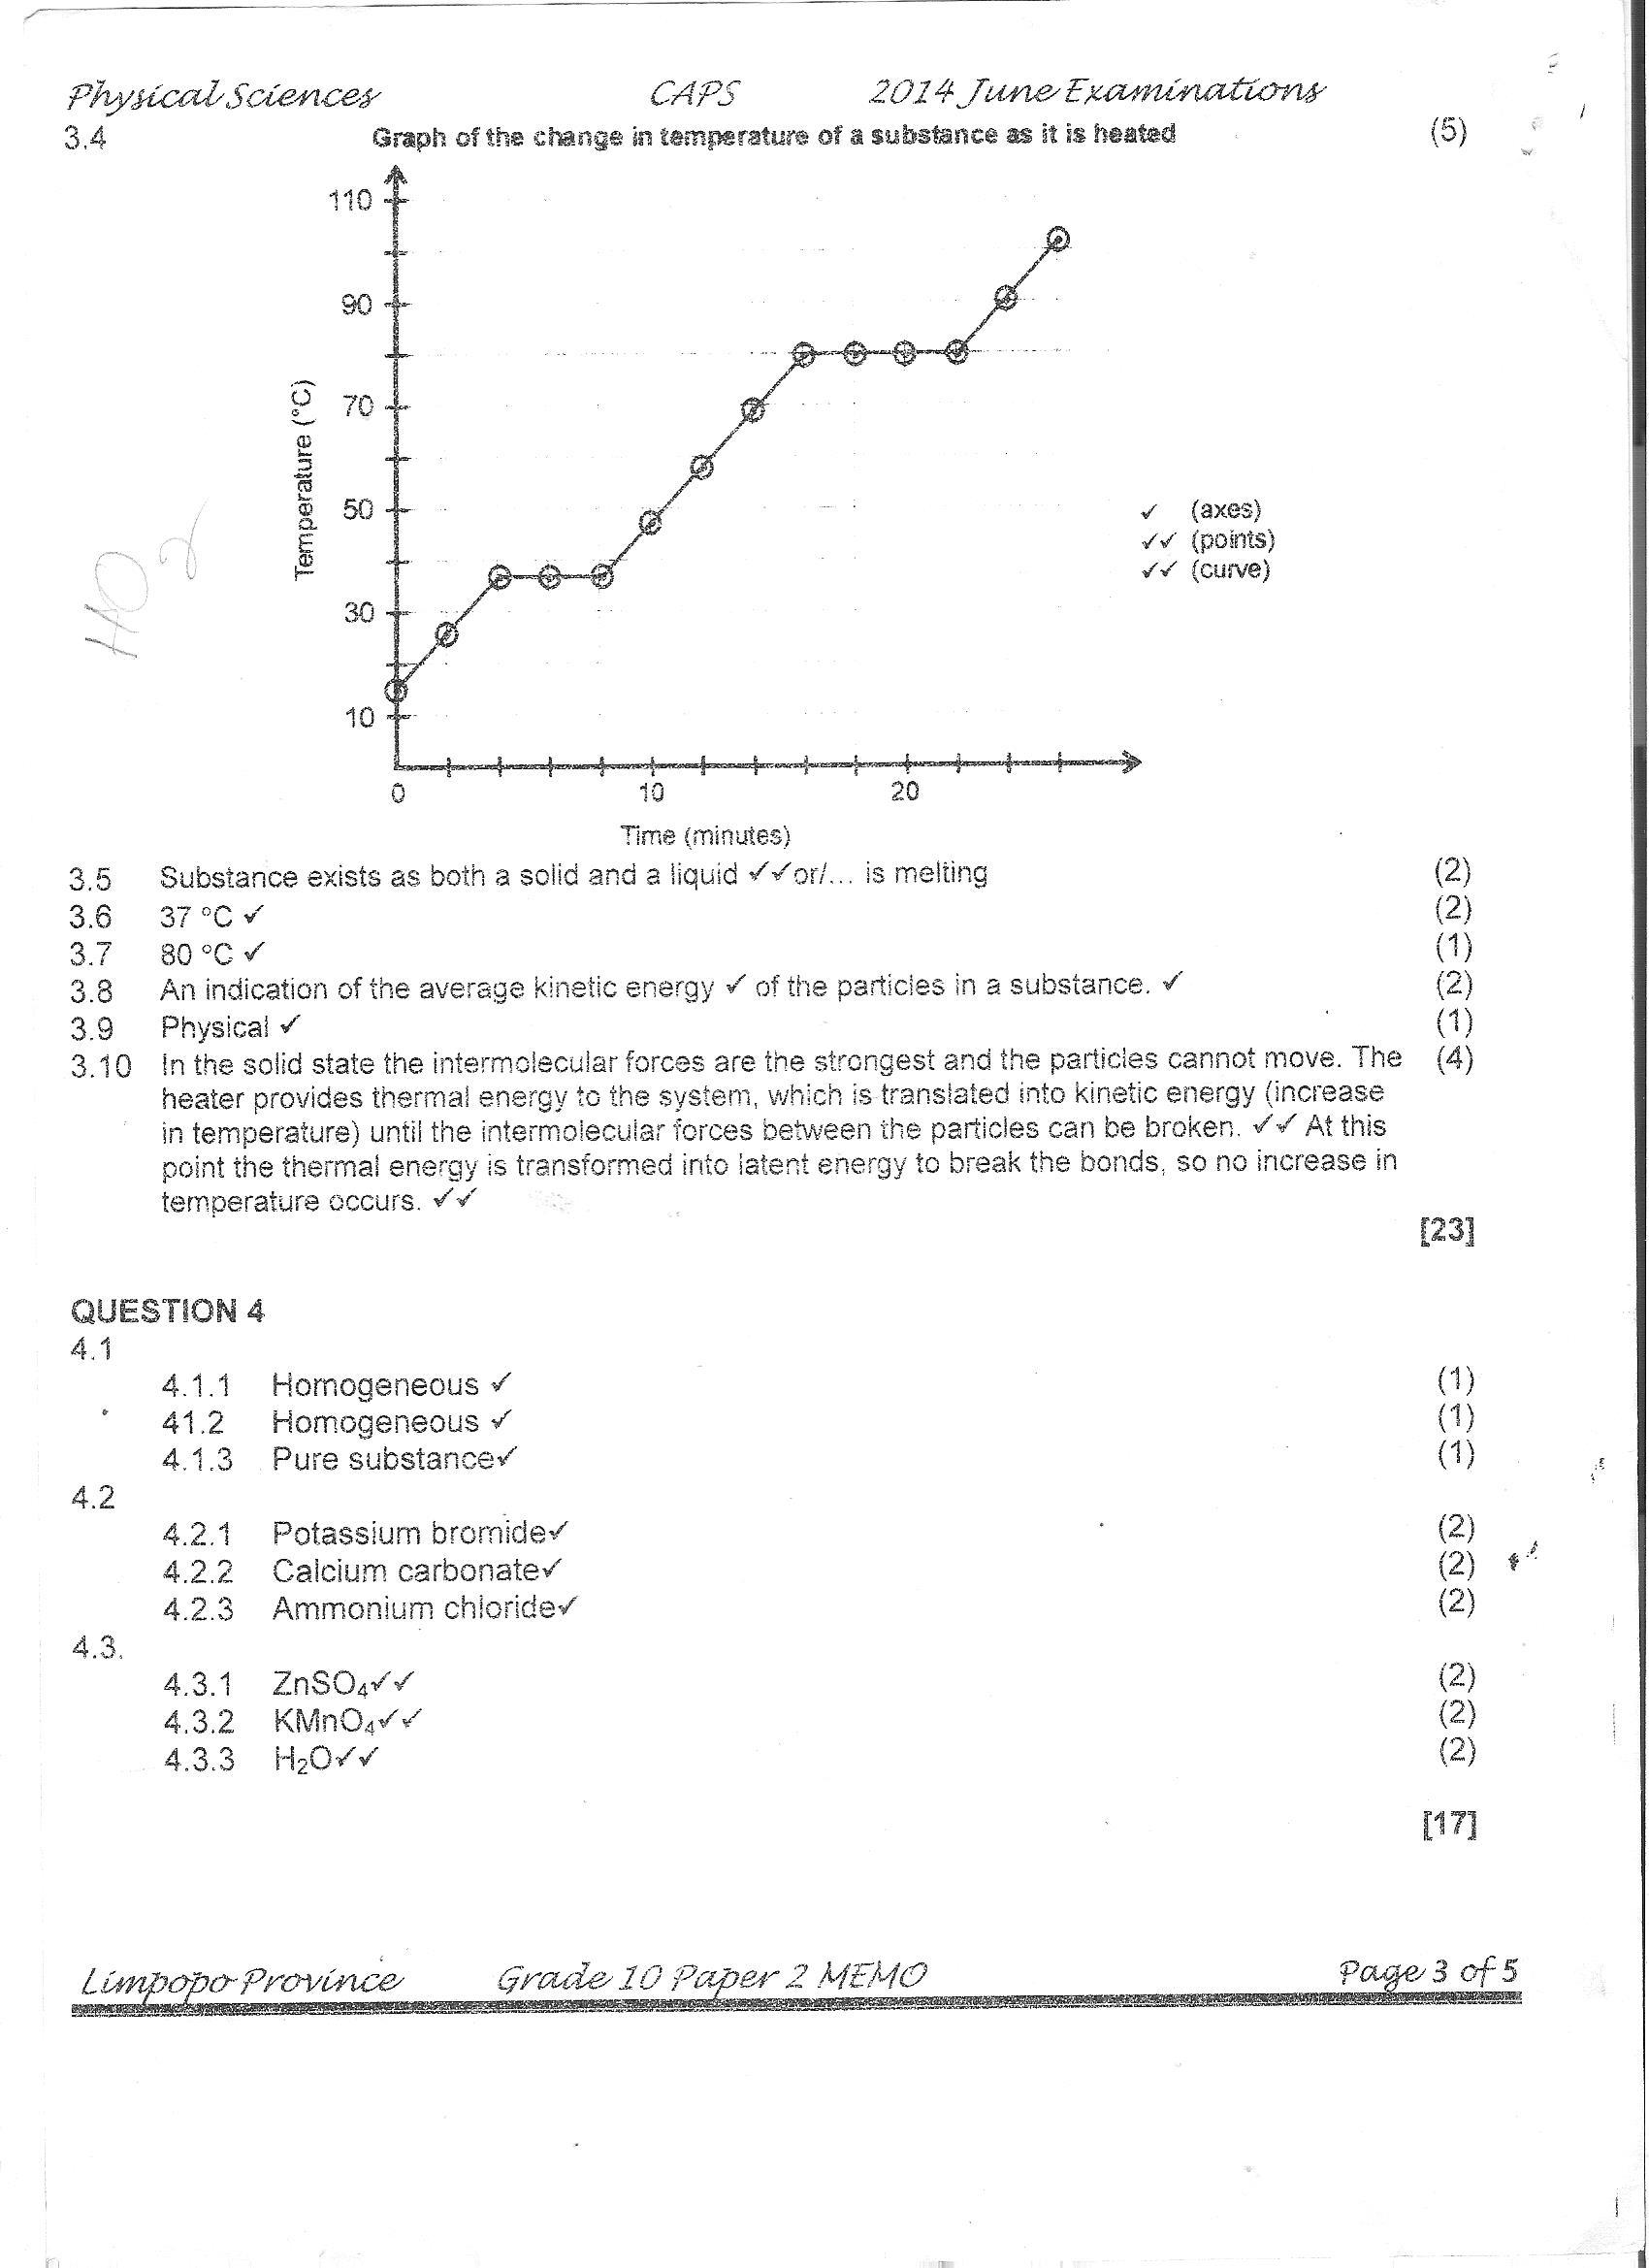 Physical science exemplar p1 2014 agricultural science p1 nov grd 10 2017 array maths lit p2 grade 12 college paper service smessayrkgg iktichaf info rh smessayrkgg iktichaf fandeluxe Gallery